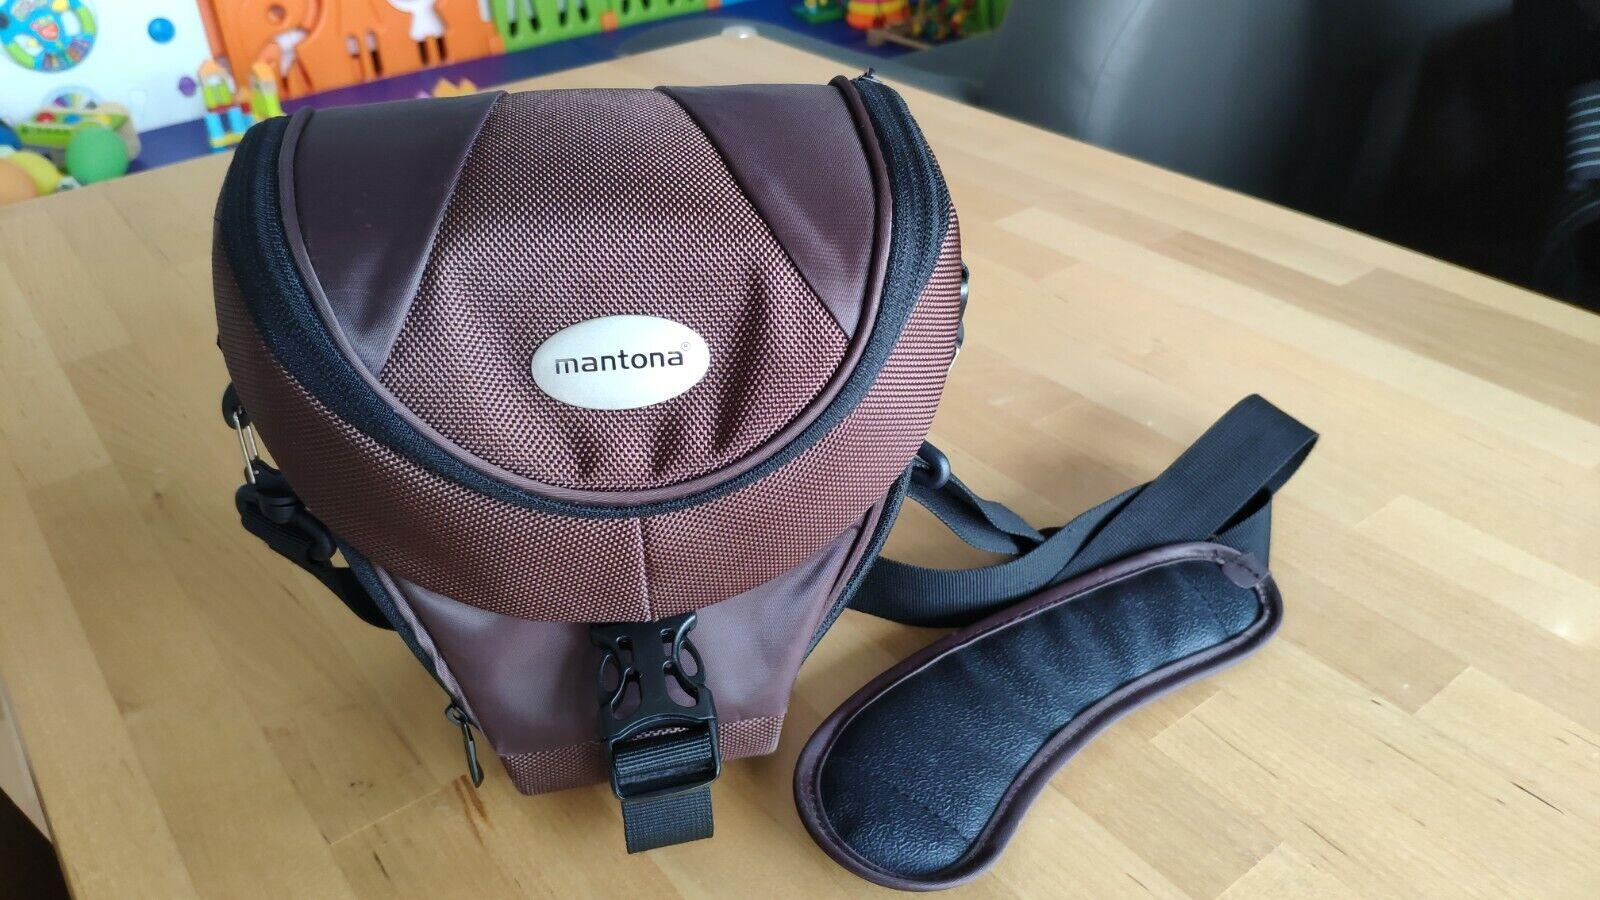 Mantona Colt DSLR Kamera Tasche für Spiegelreflex SLR Kompaktkamera Systemkamera